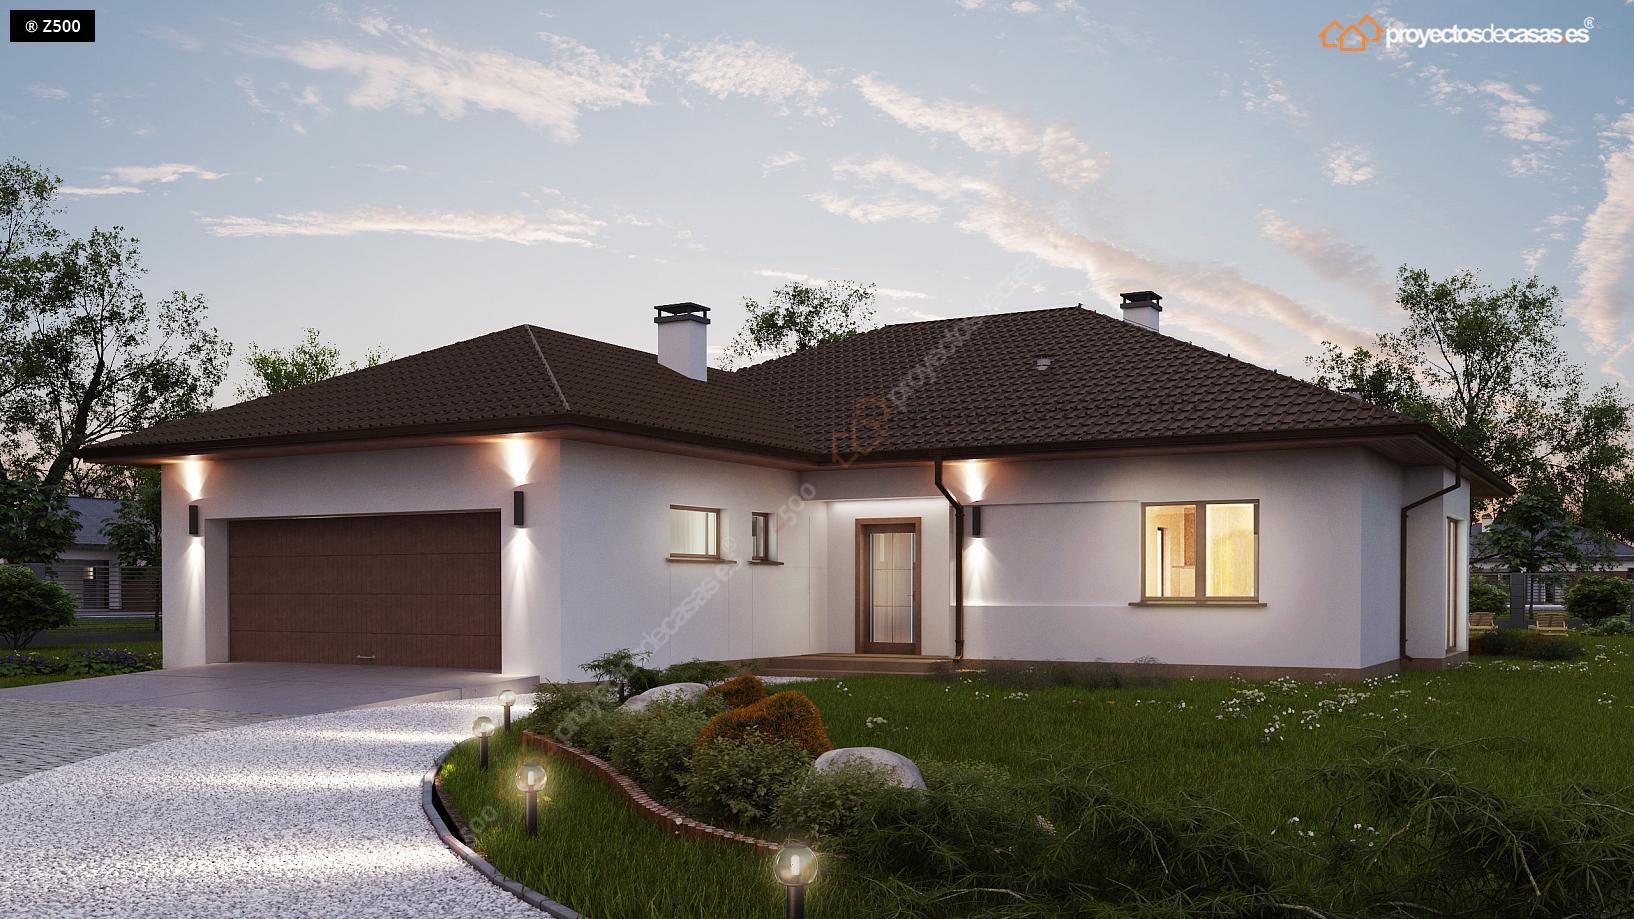 Proyectos de casas casa tradicional proyectosdecasas for Casas con planos y fotos